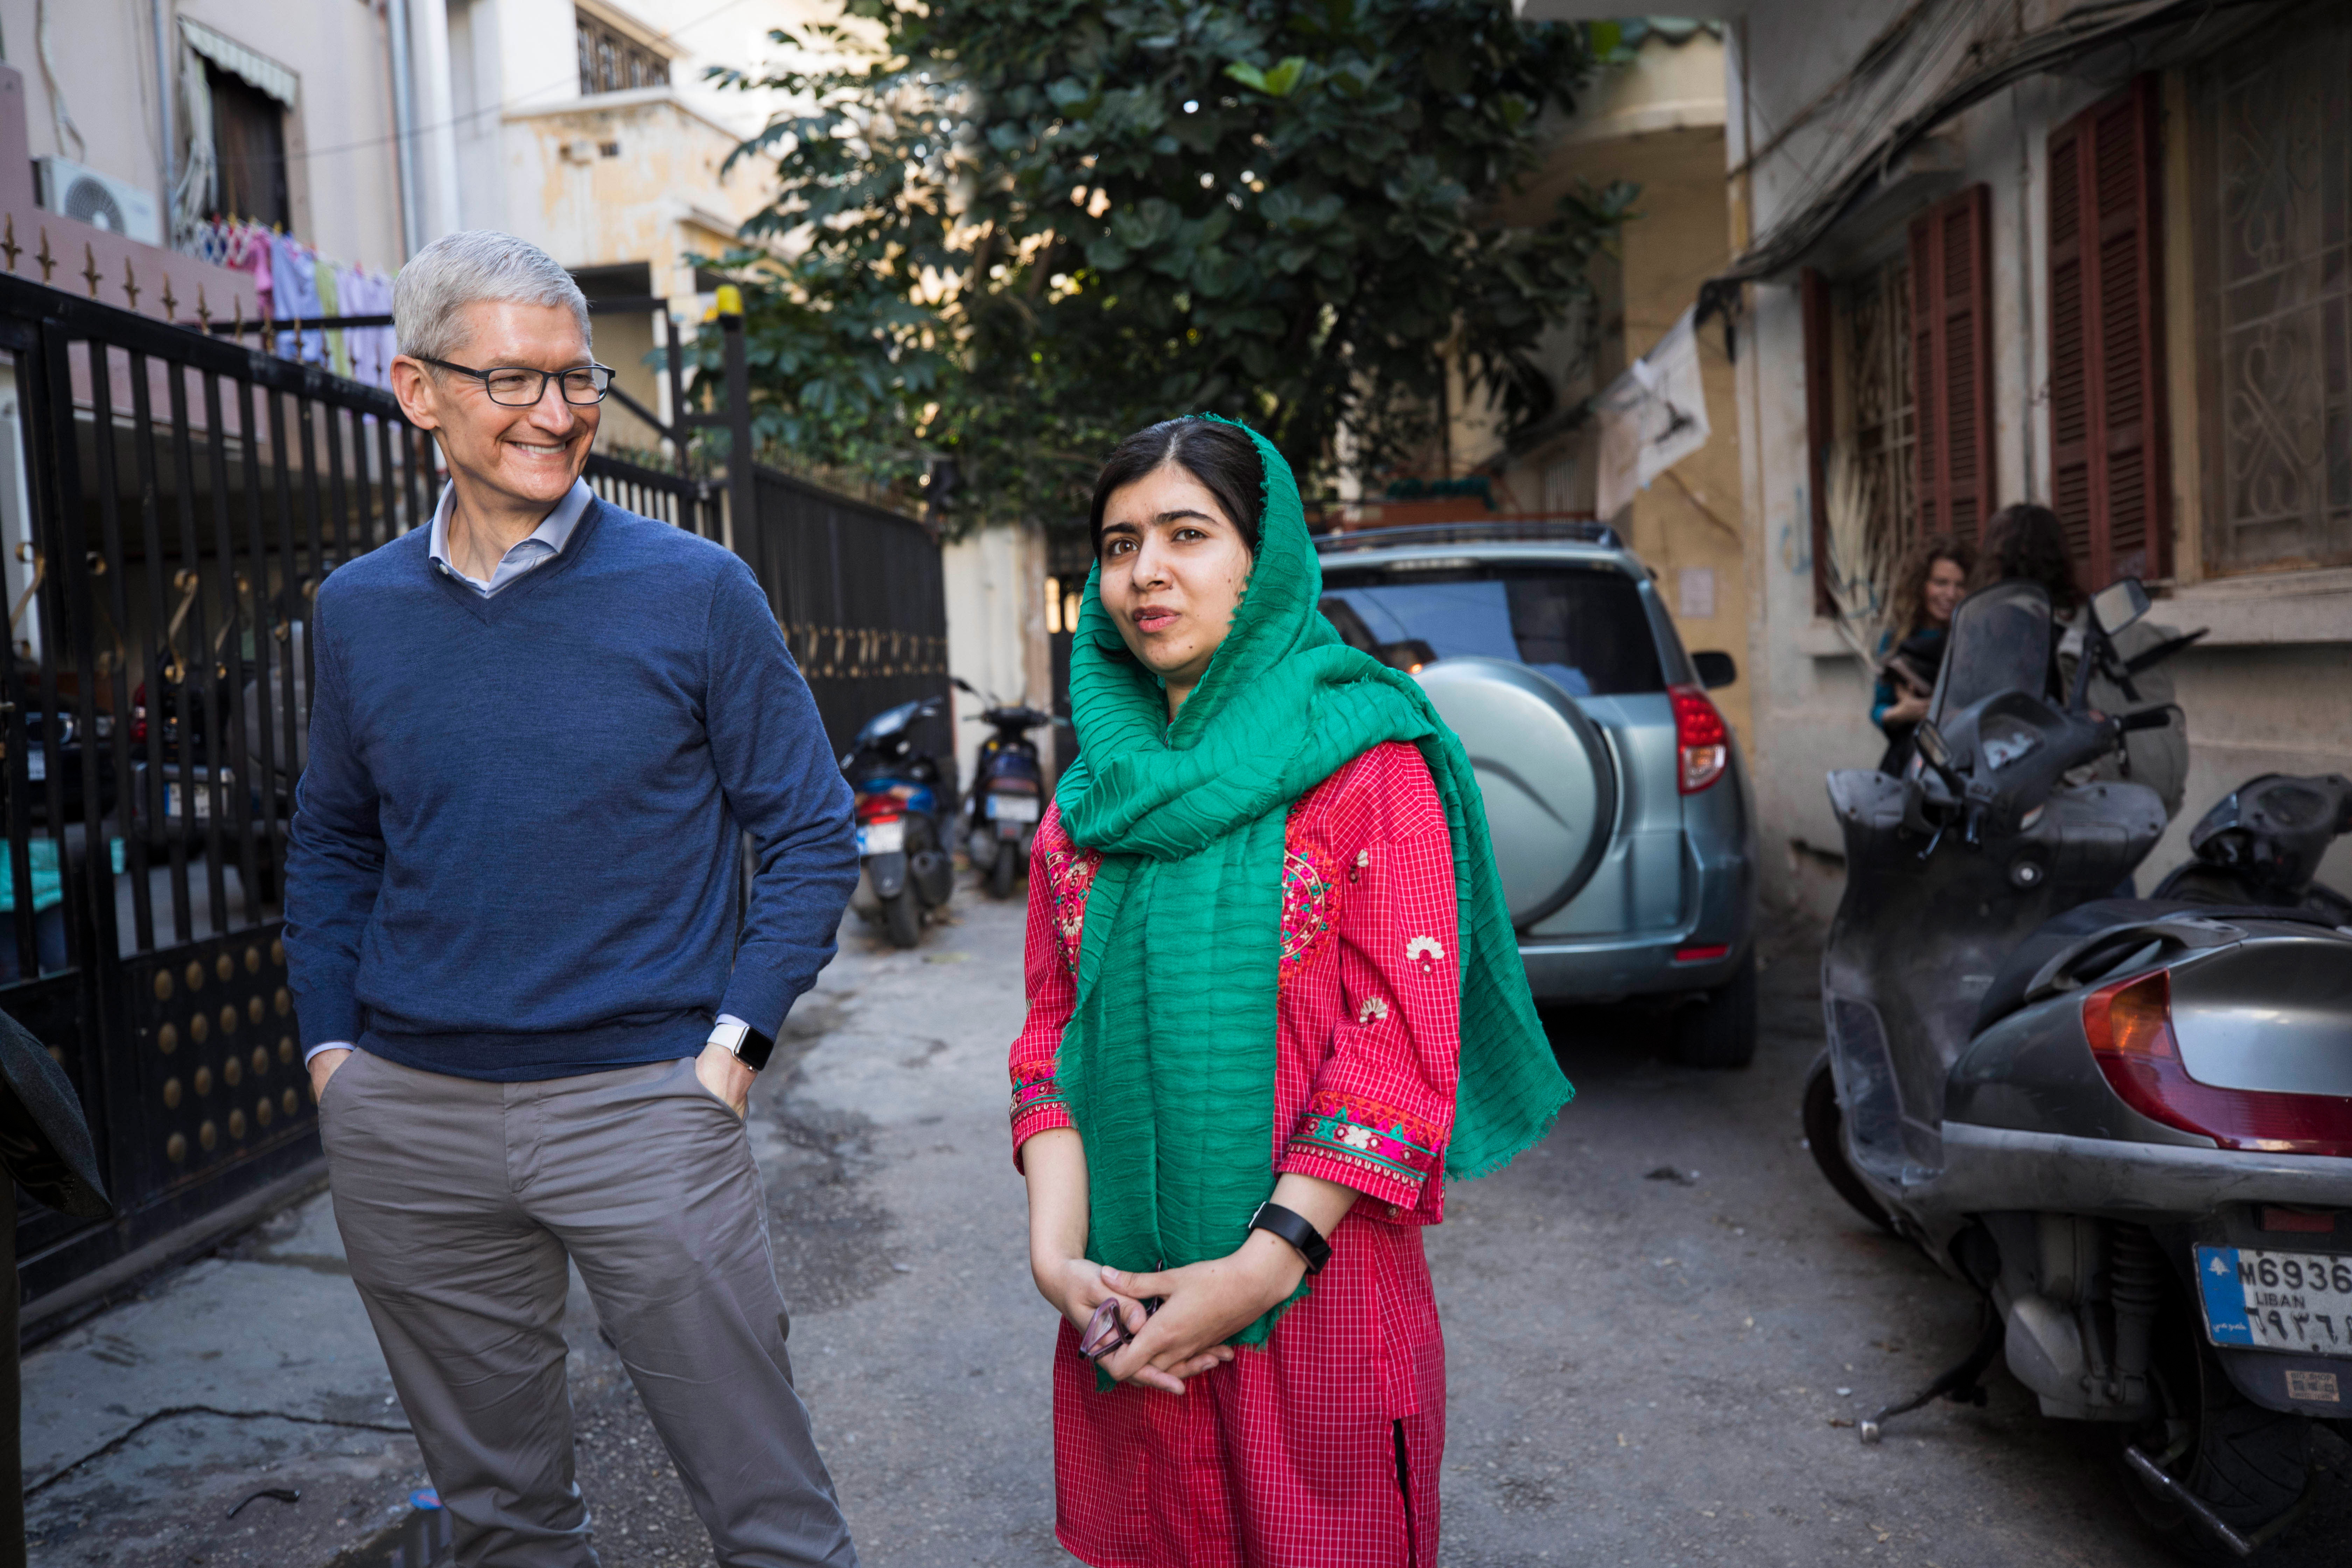 Tim Cook en Malala-Yousafzai, oprichter van het Malala Fund